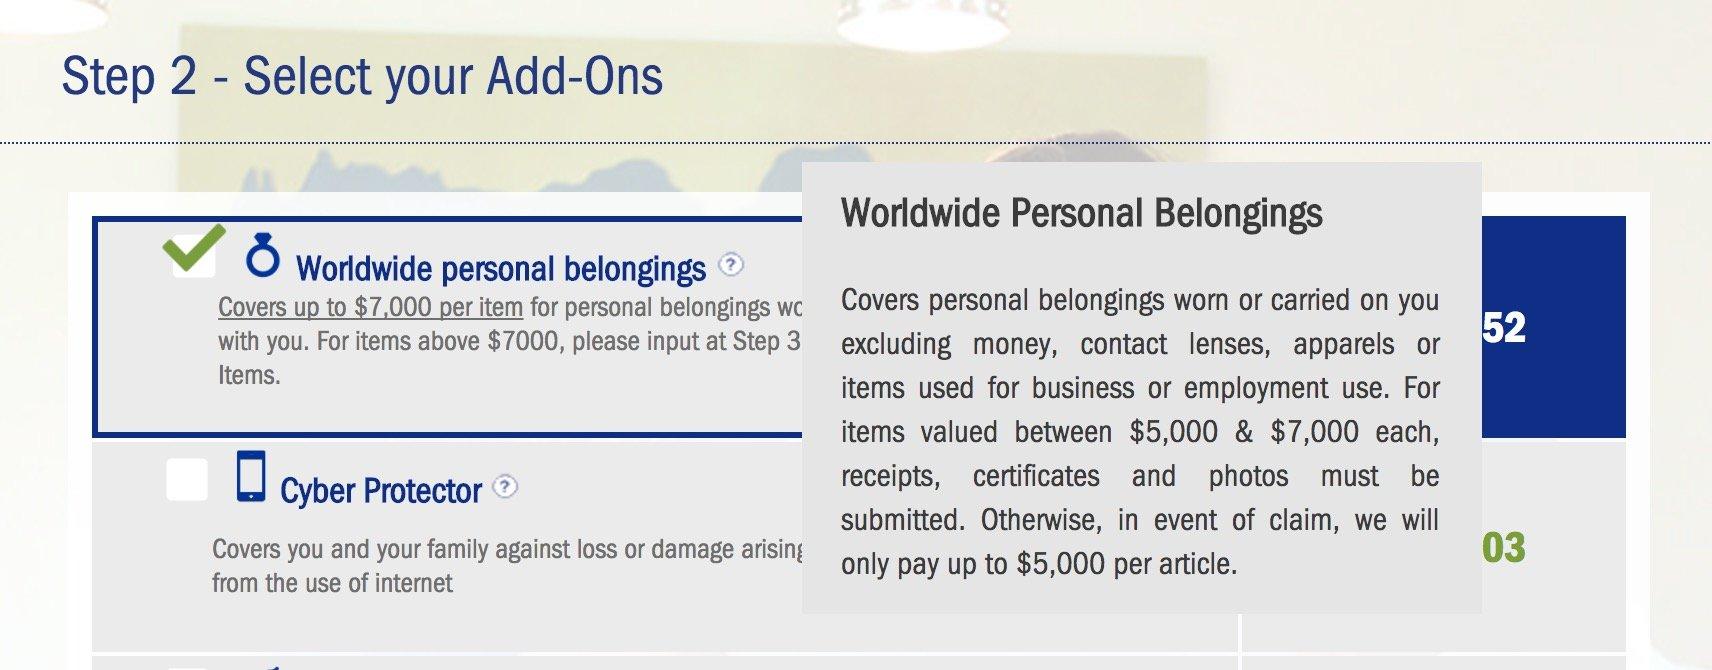 AXA home insurance personal belongings.jpg